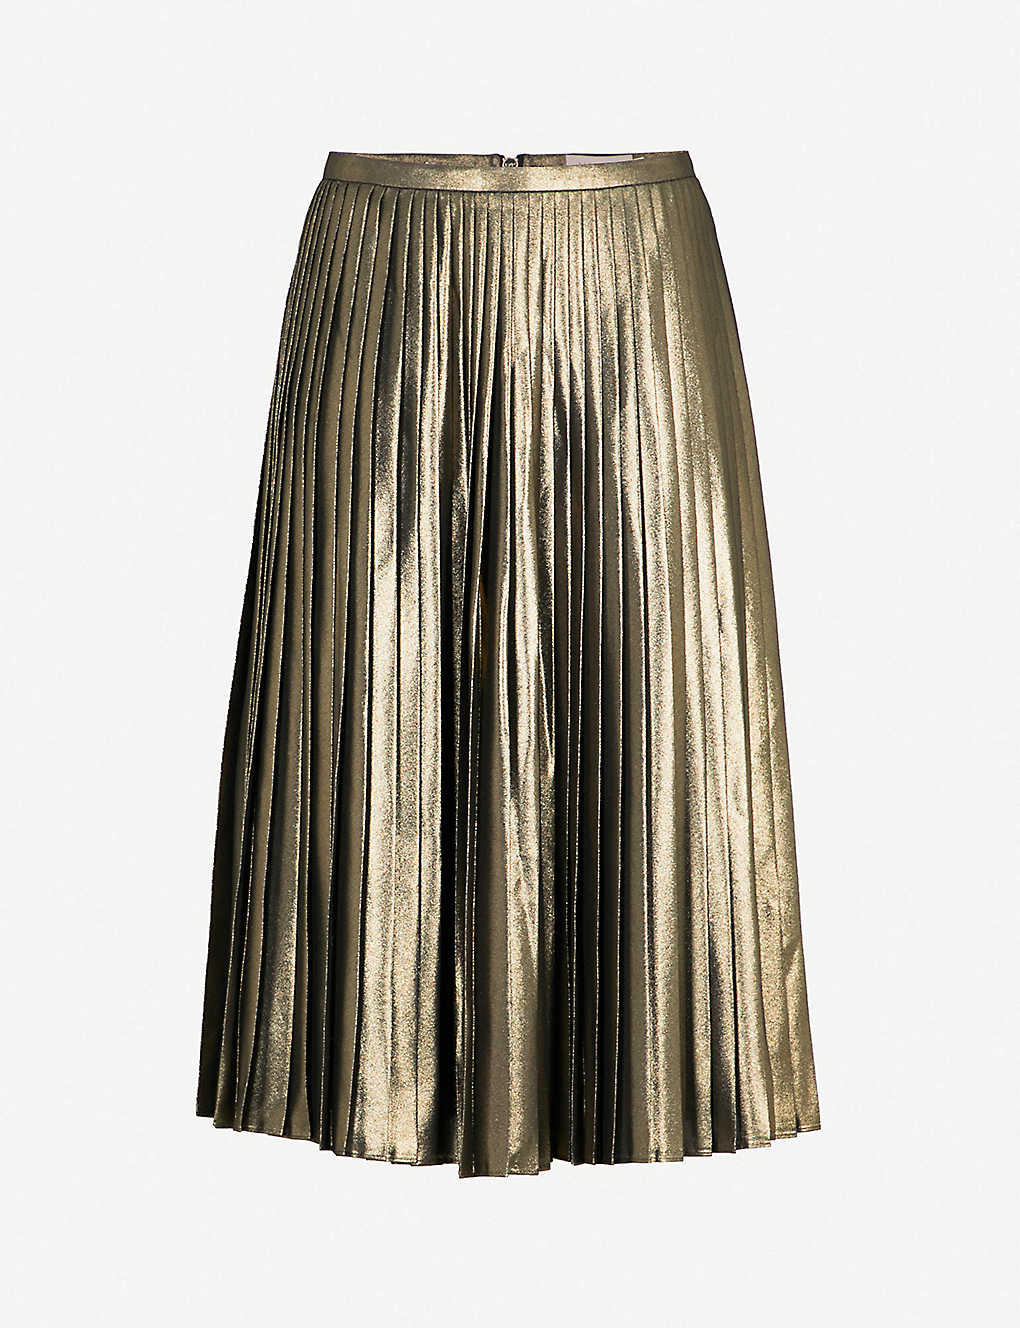 cc87d4b771 Metallic Pleated Skirts Online India